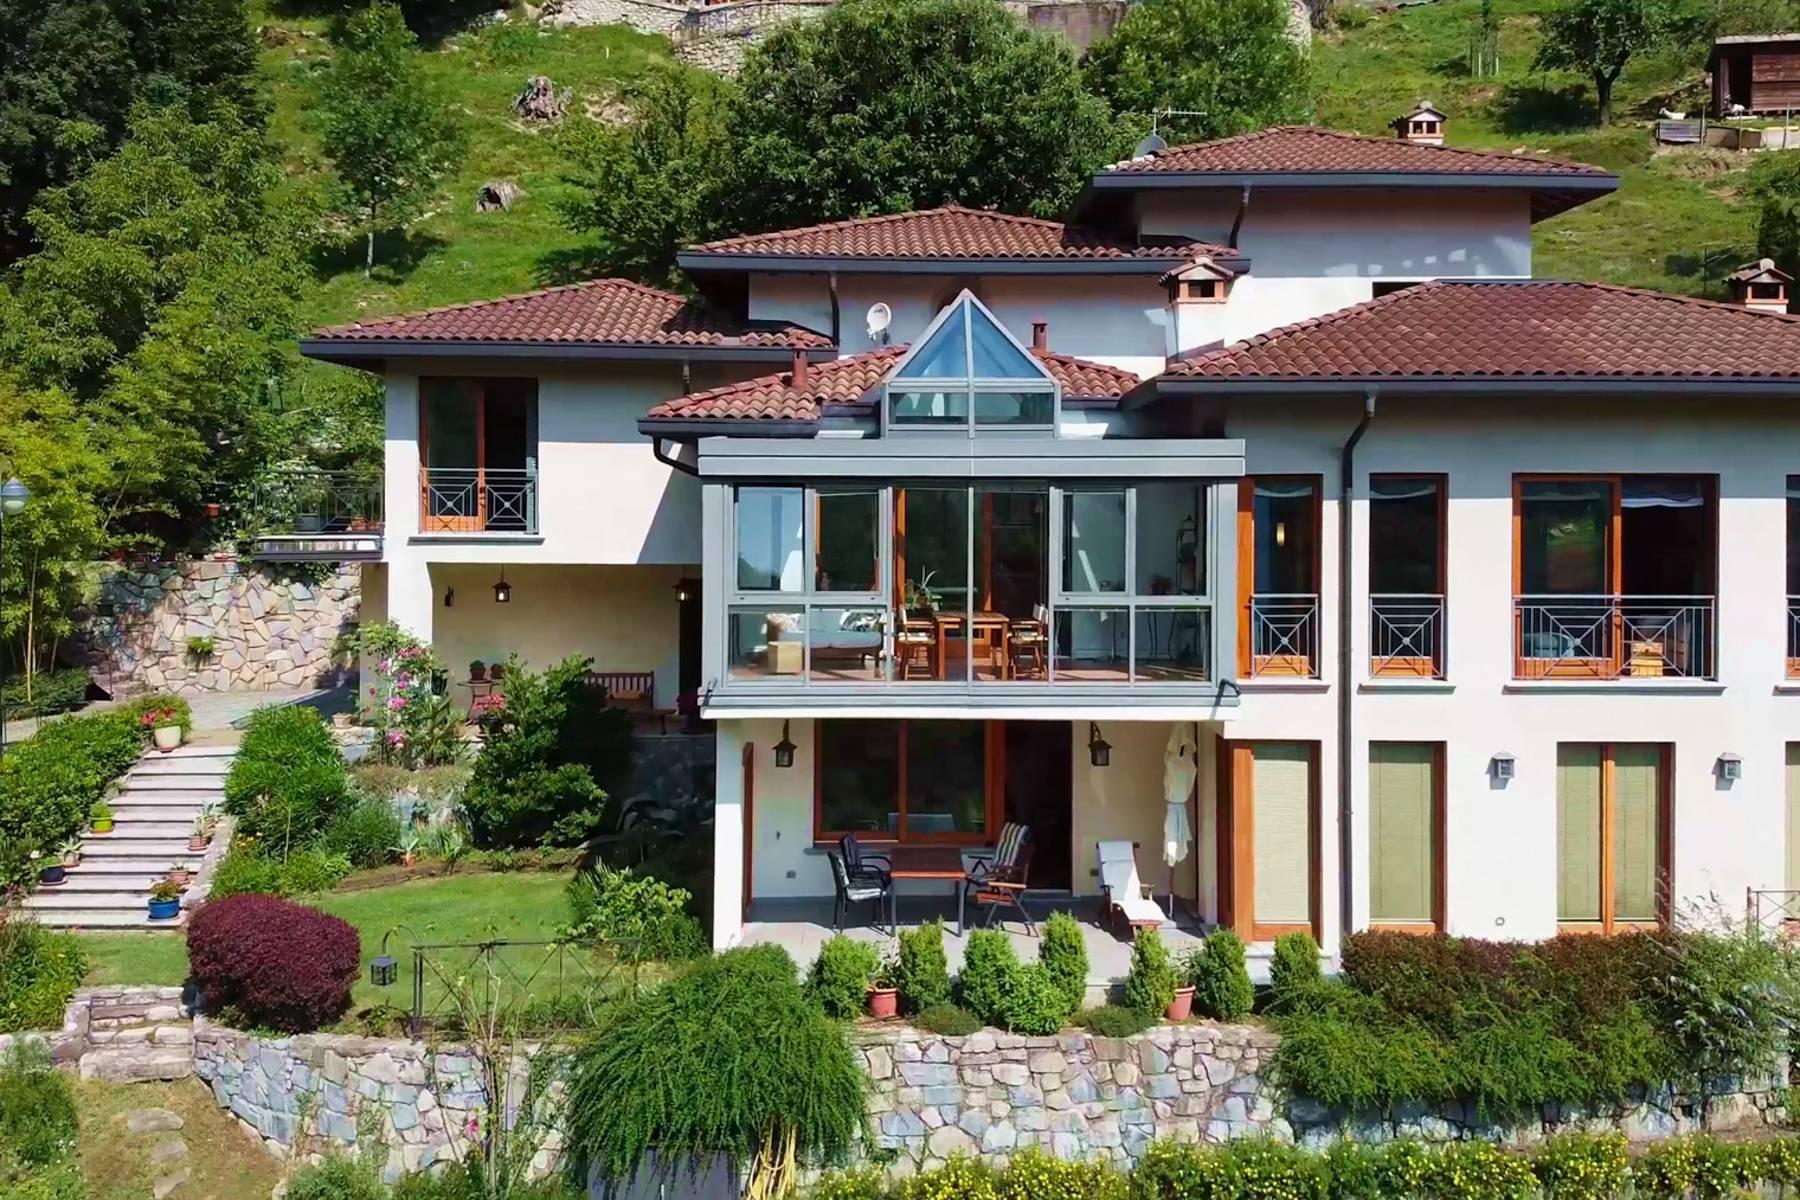 Splendida villa moderna sulla collina soleggiata sopra Argegno - 2